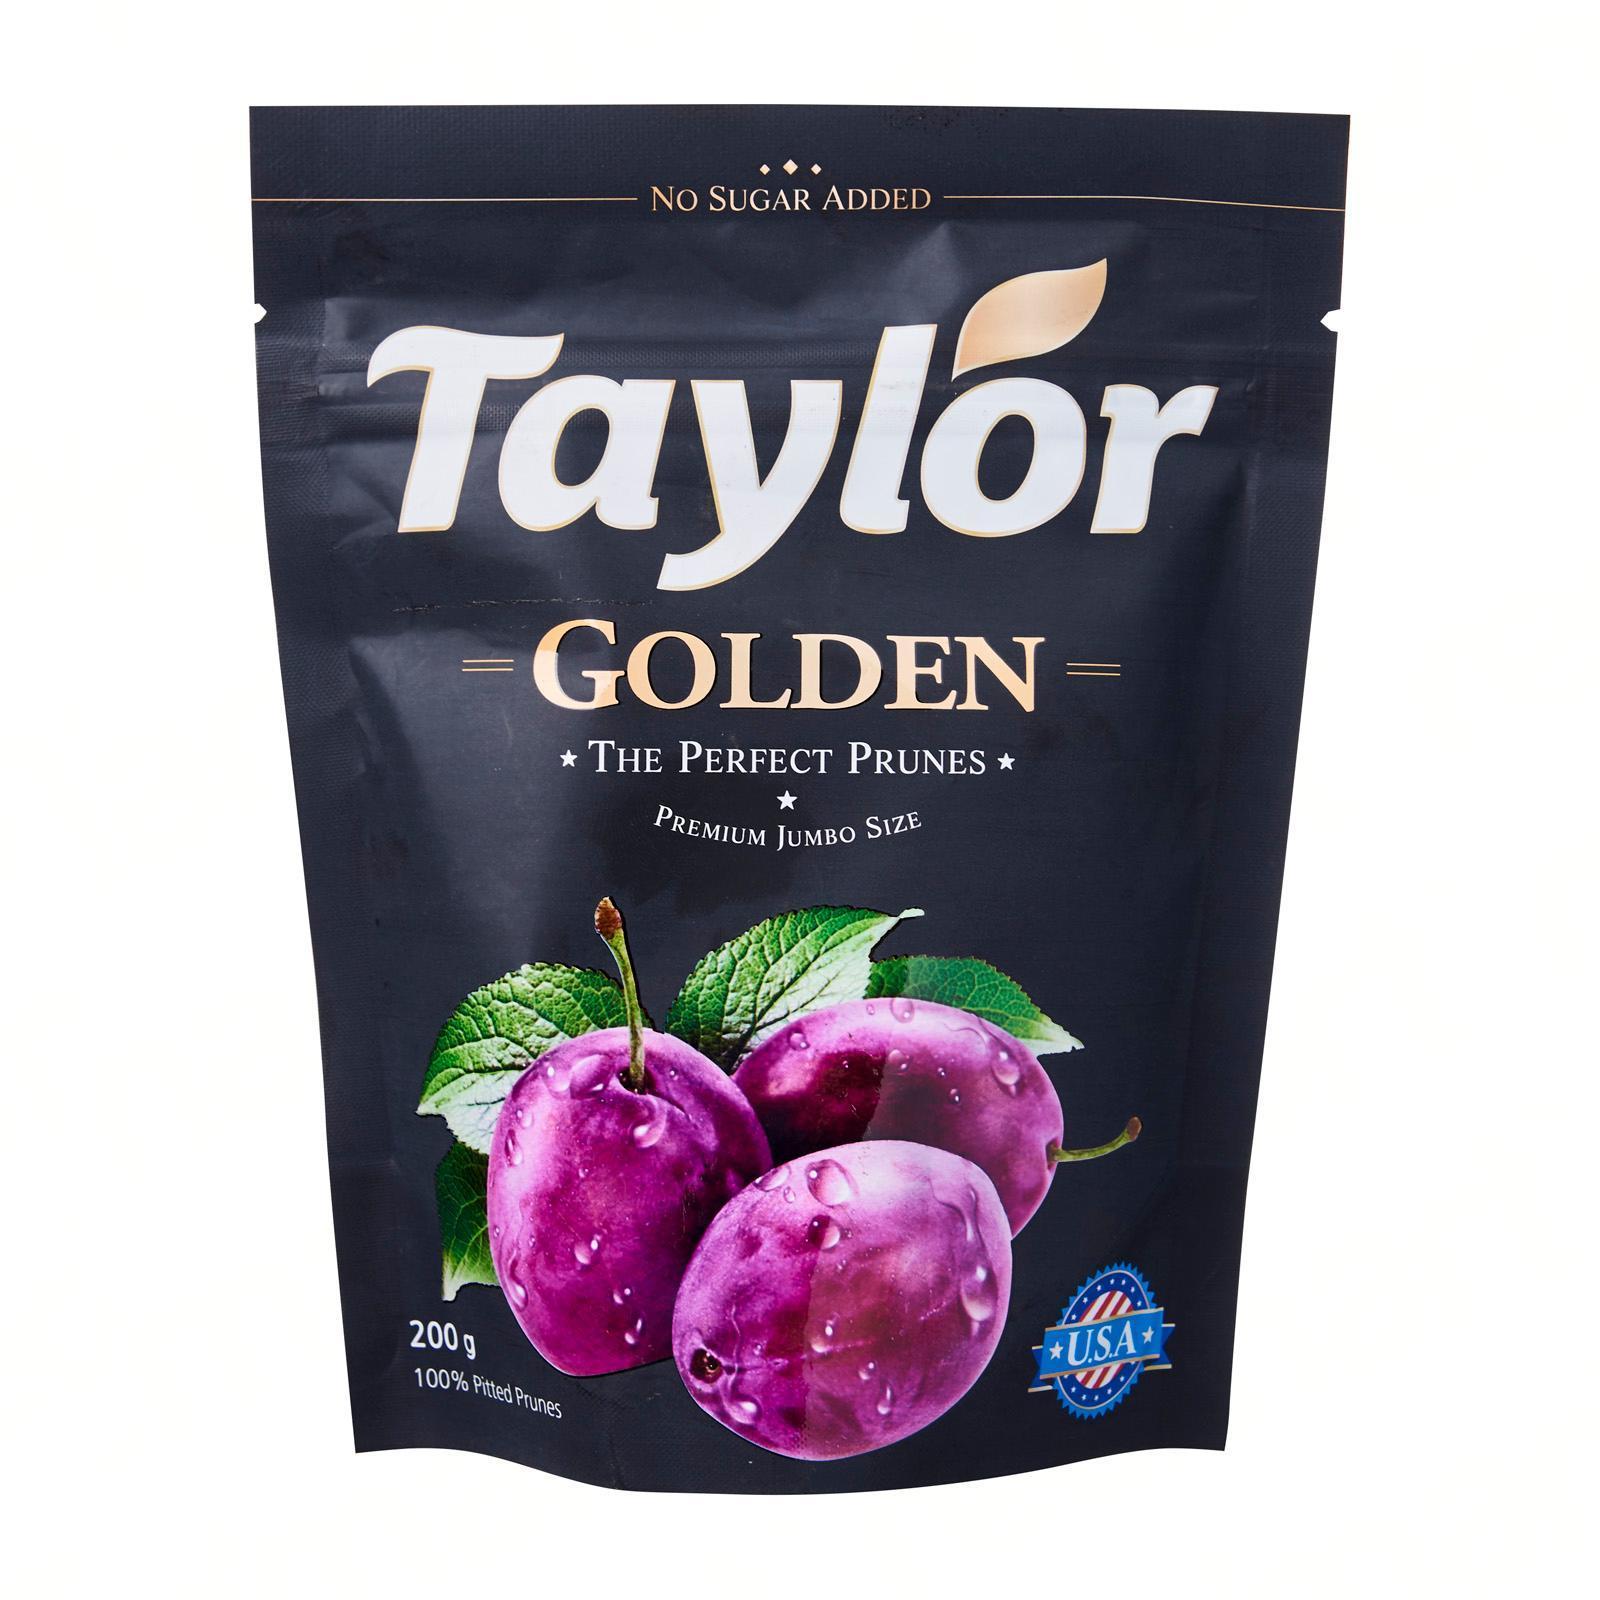 TAYLOR Naturally Sweet Golden Prunes (Jumbo)